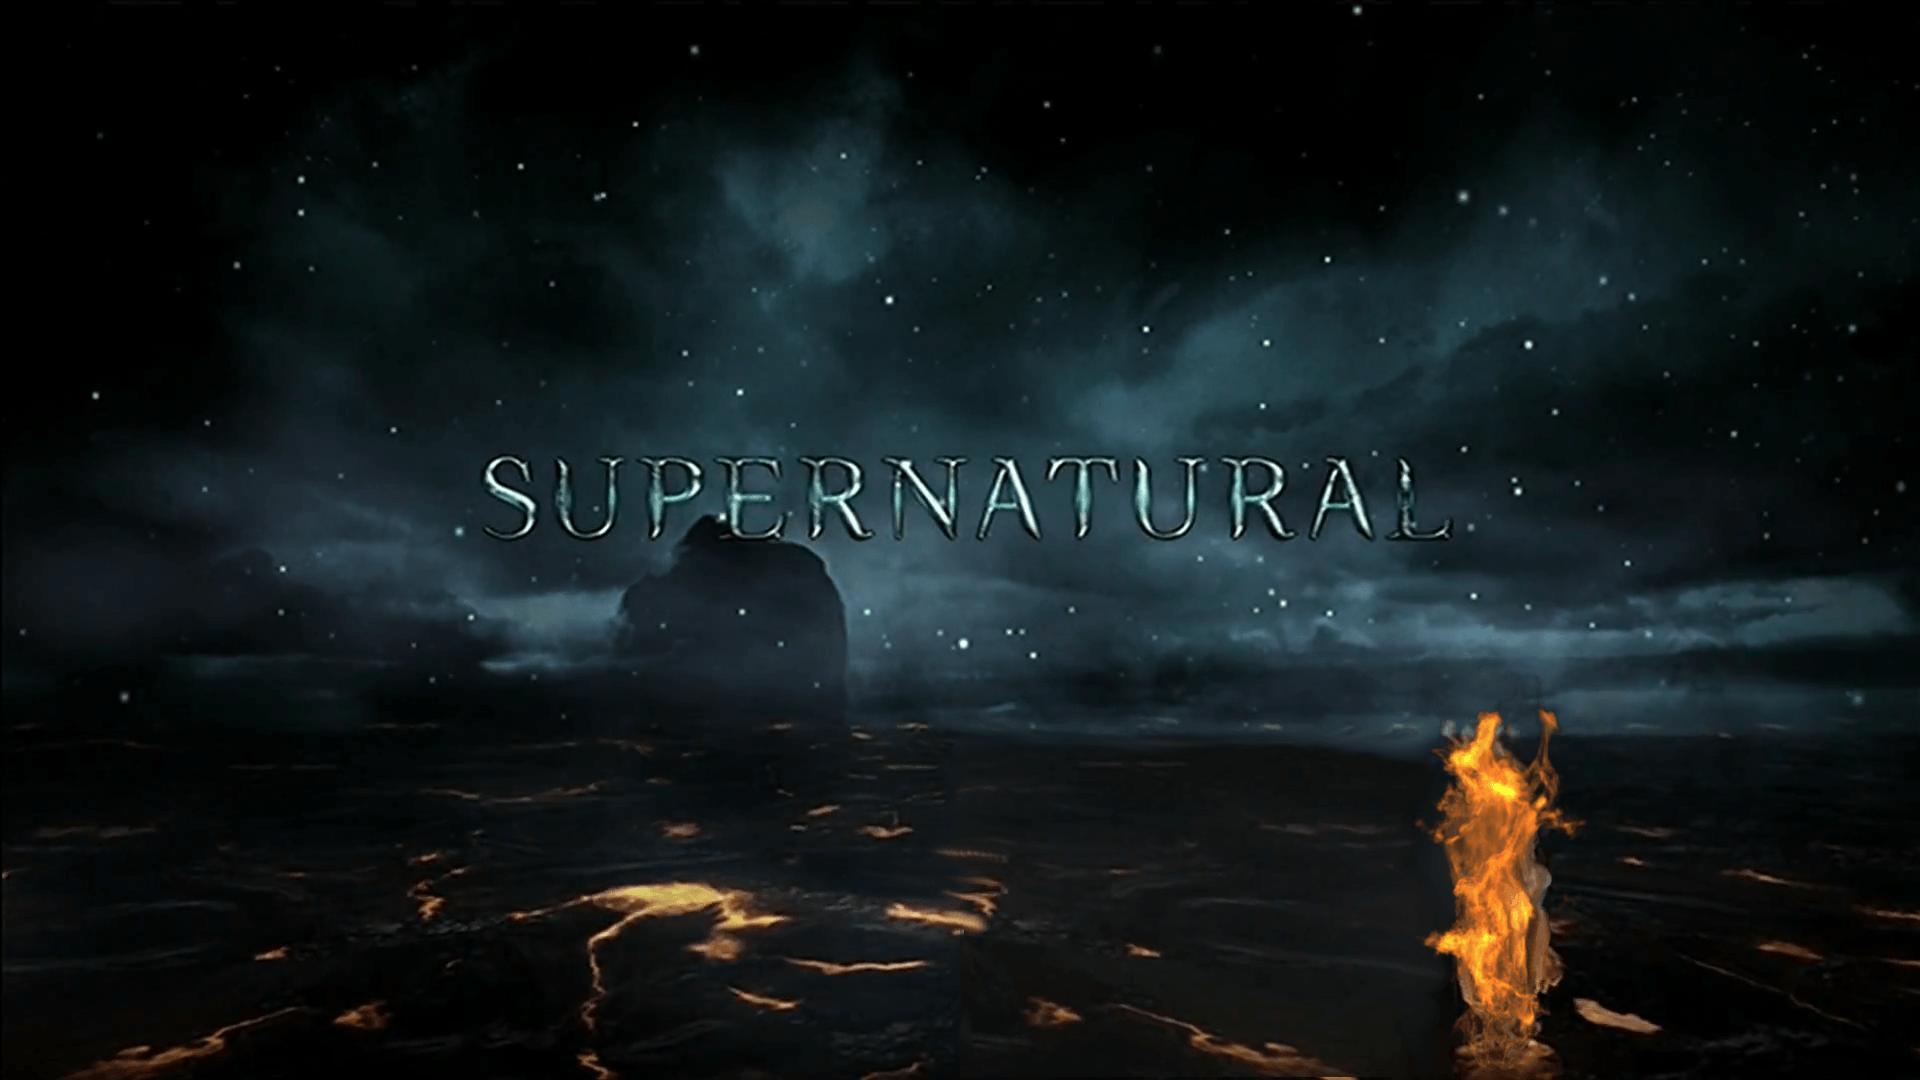 supernatural wallpapers 2016 wallpaper cave